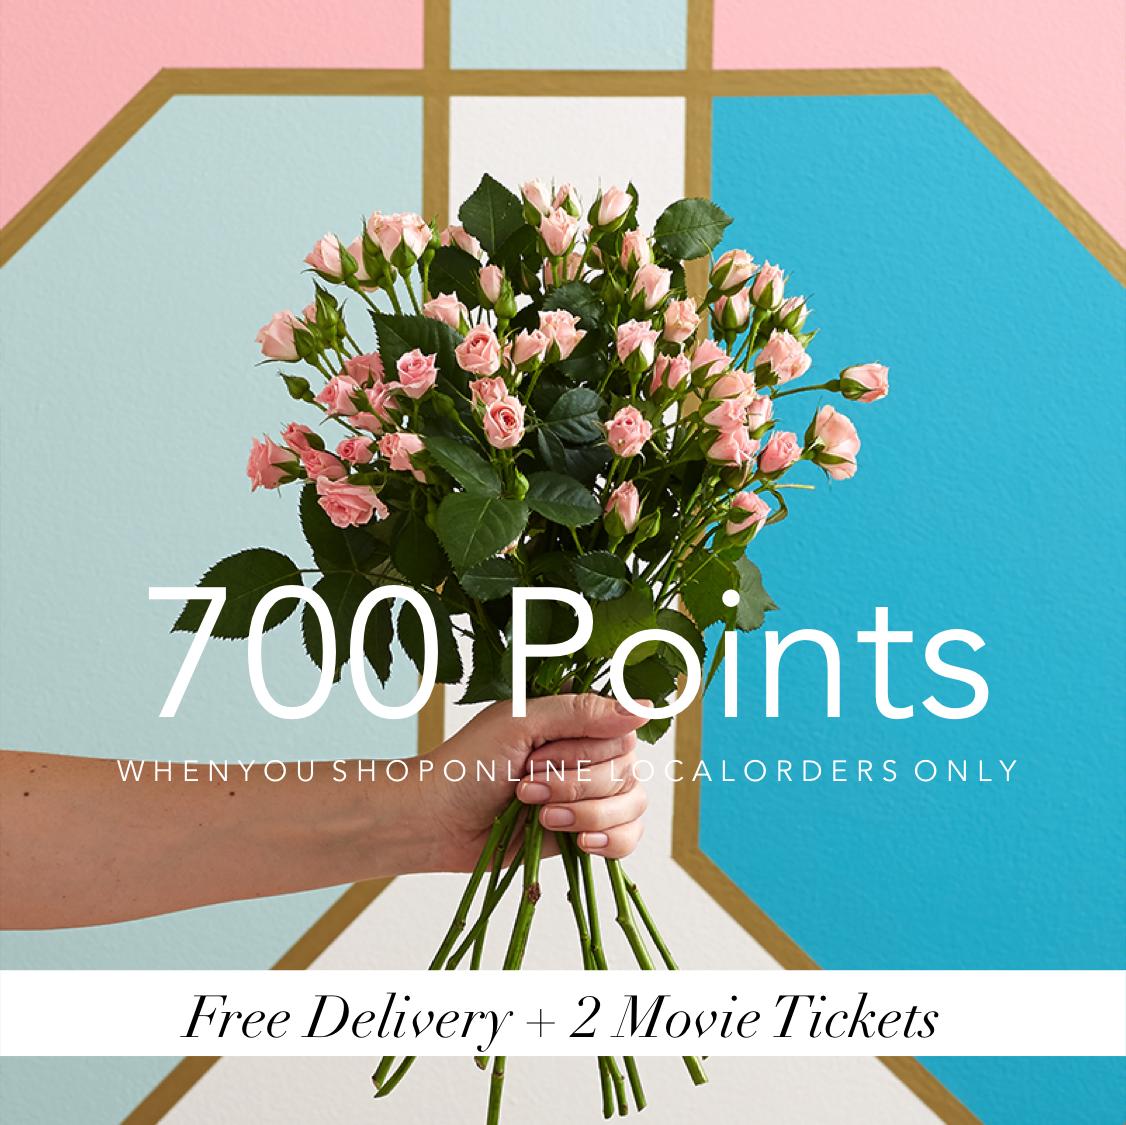 reward-points-3-angie-s-floral-designs-el-paso-florist-floreria-el-paso-angie-s-floral-designs-shop-flowers-online-el-paso-delivery-.png